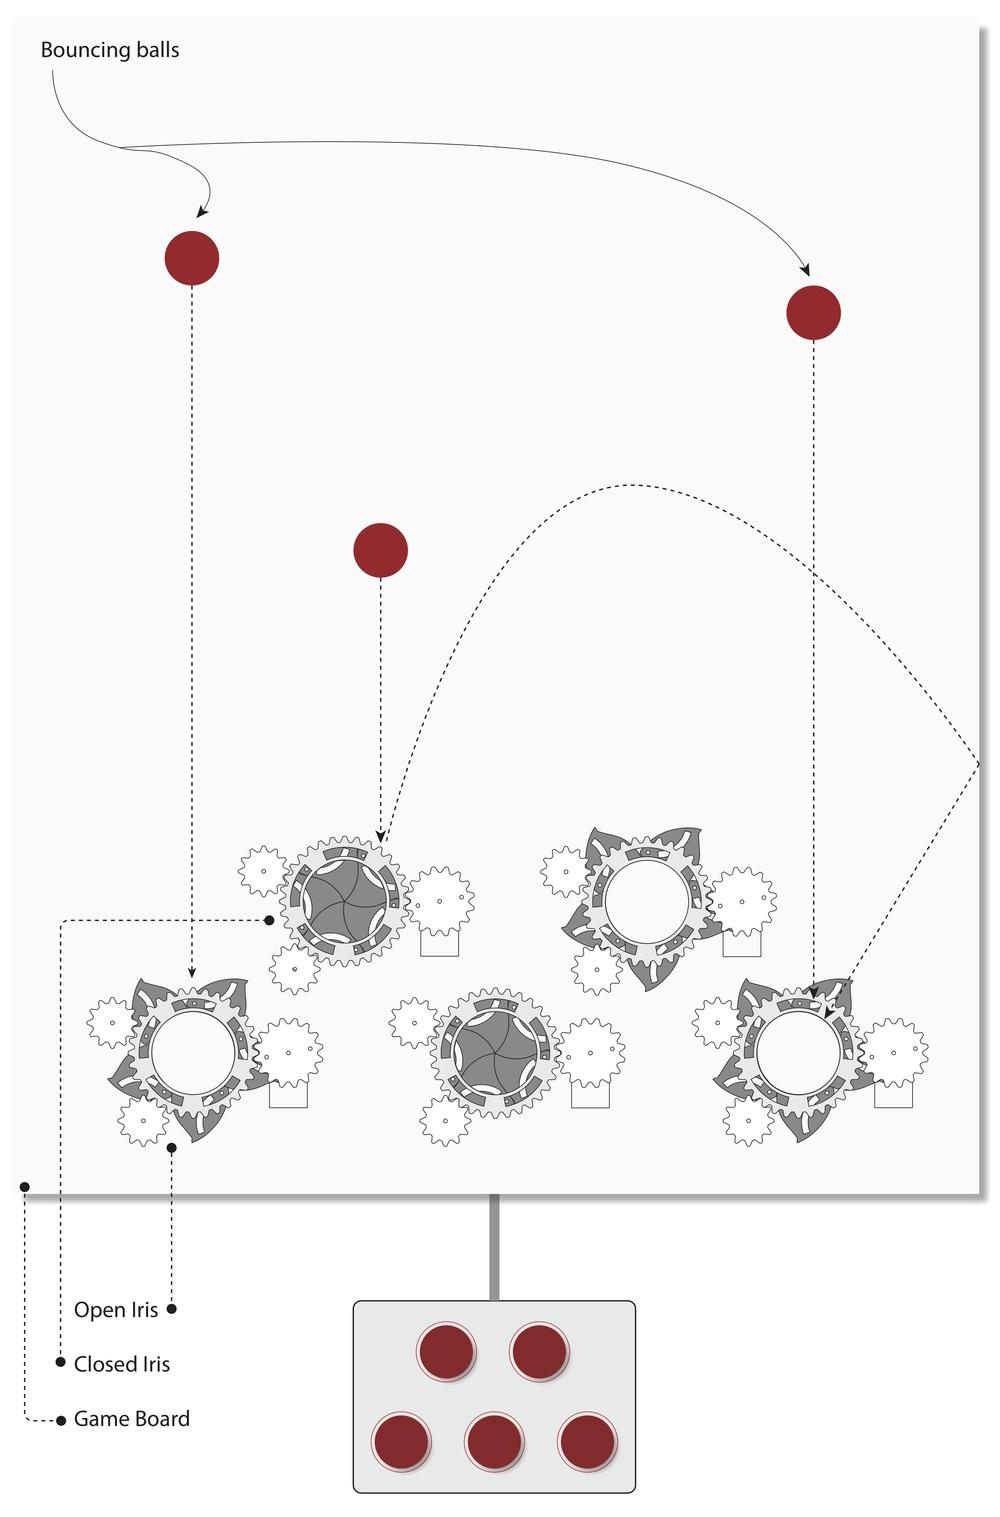 iris_diagram001.jpg